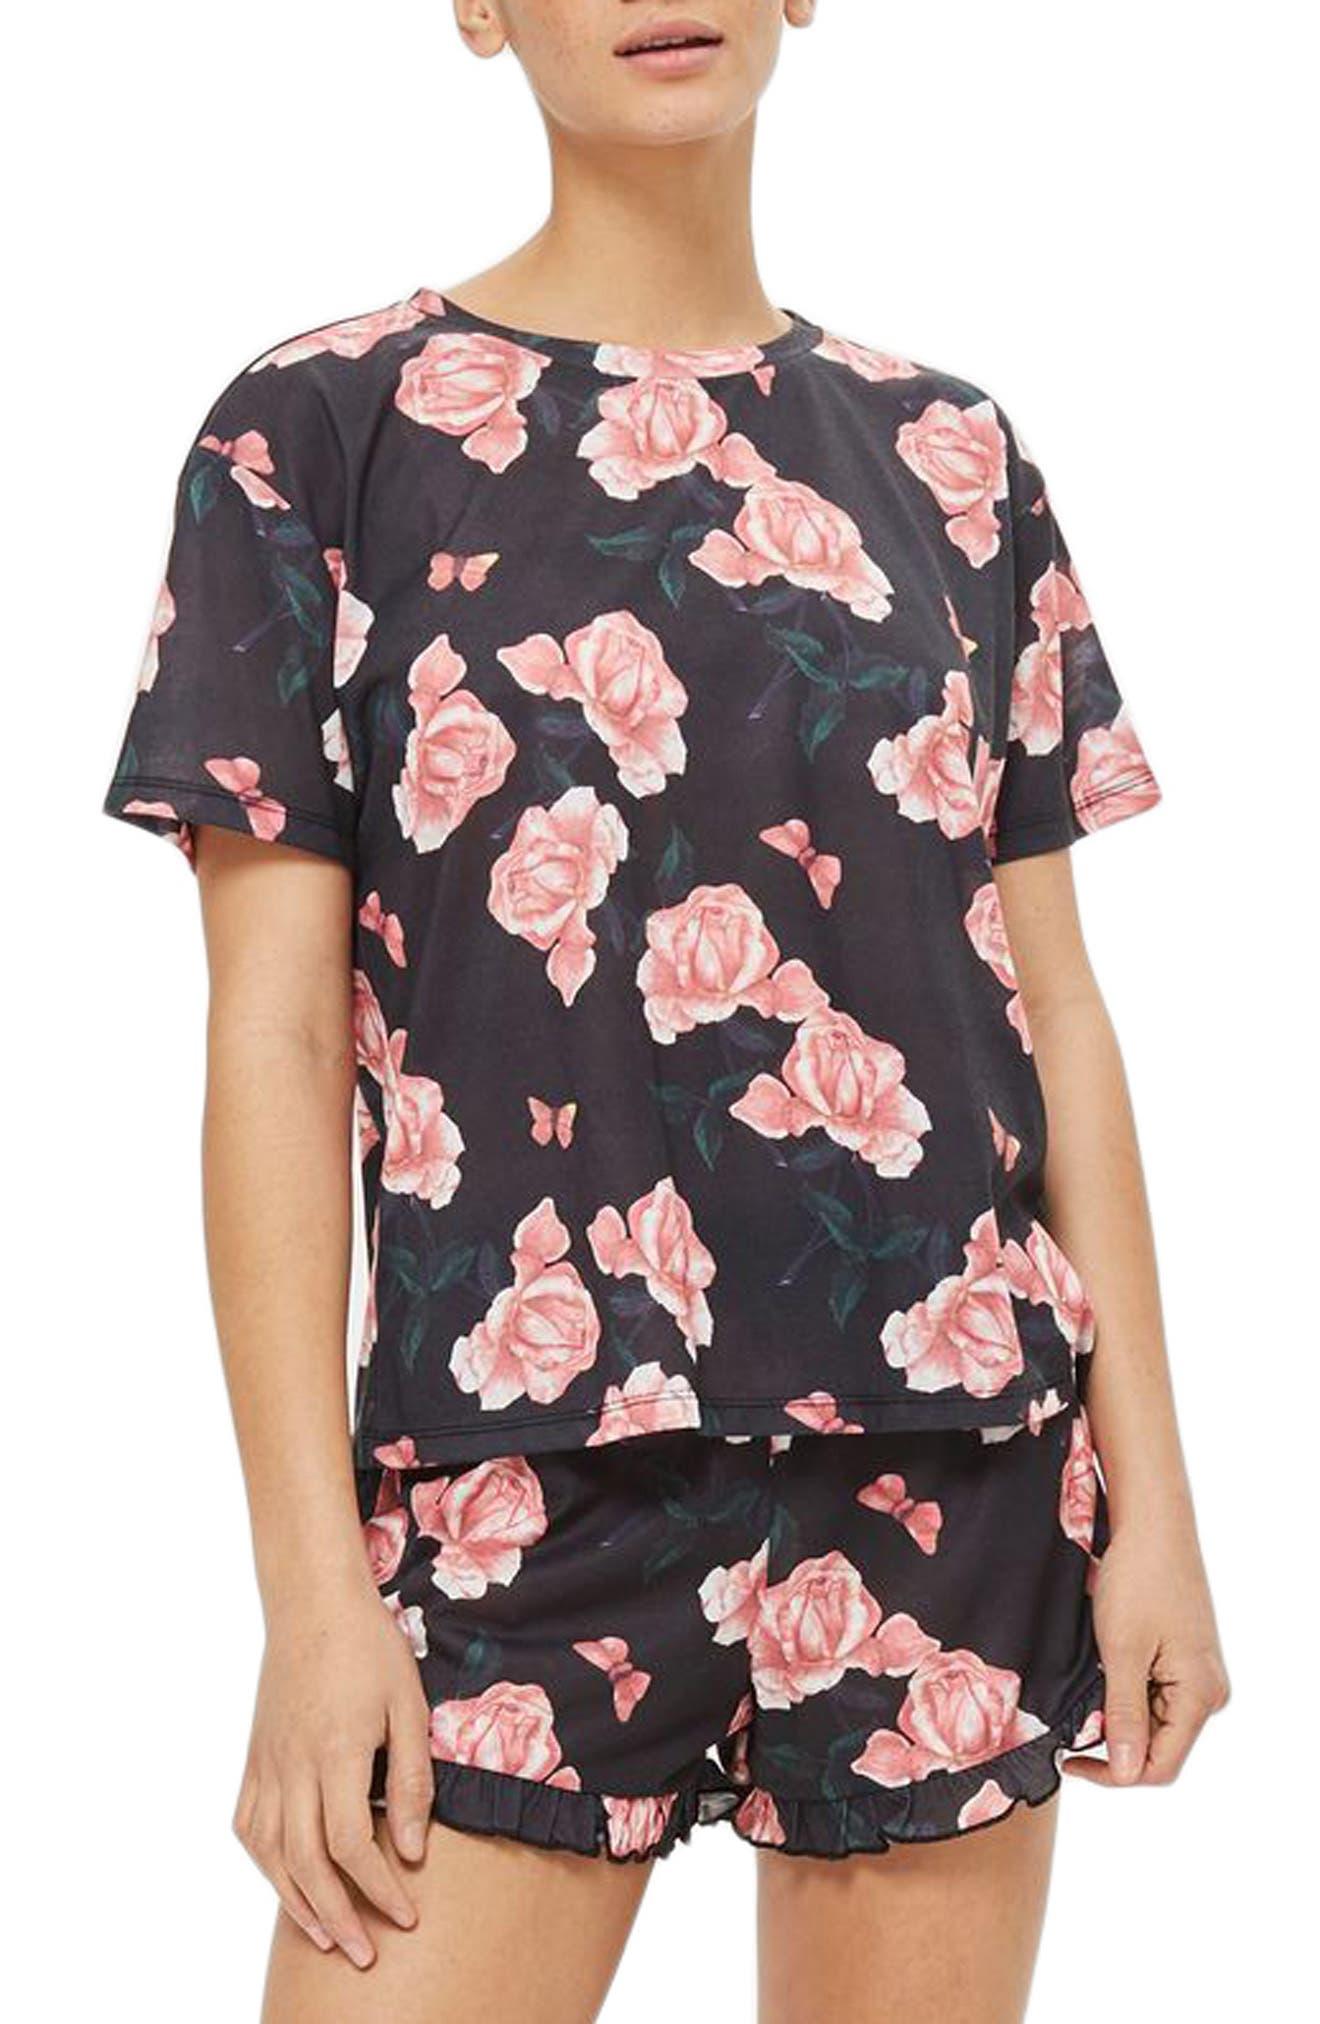 Rose Pajama Top,                             Main thumbnail 1, color,                             001